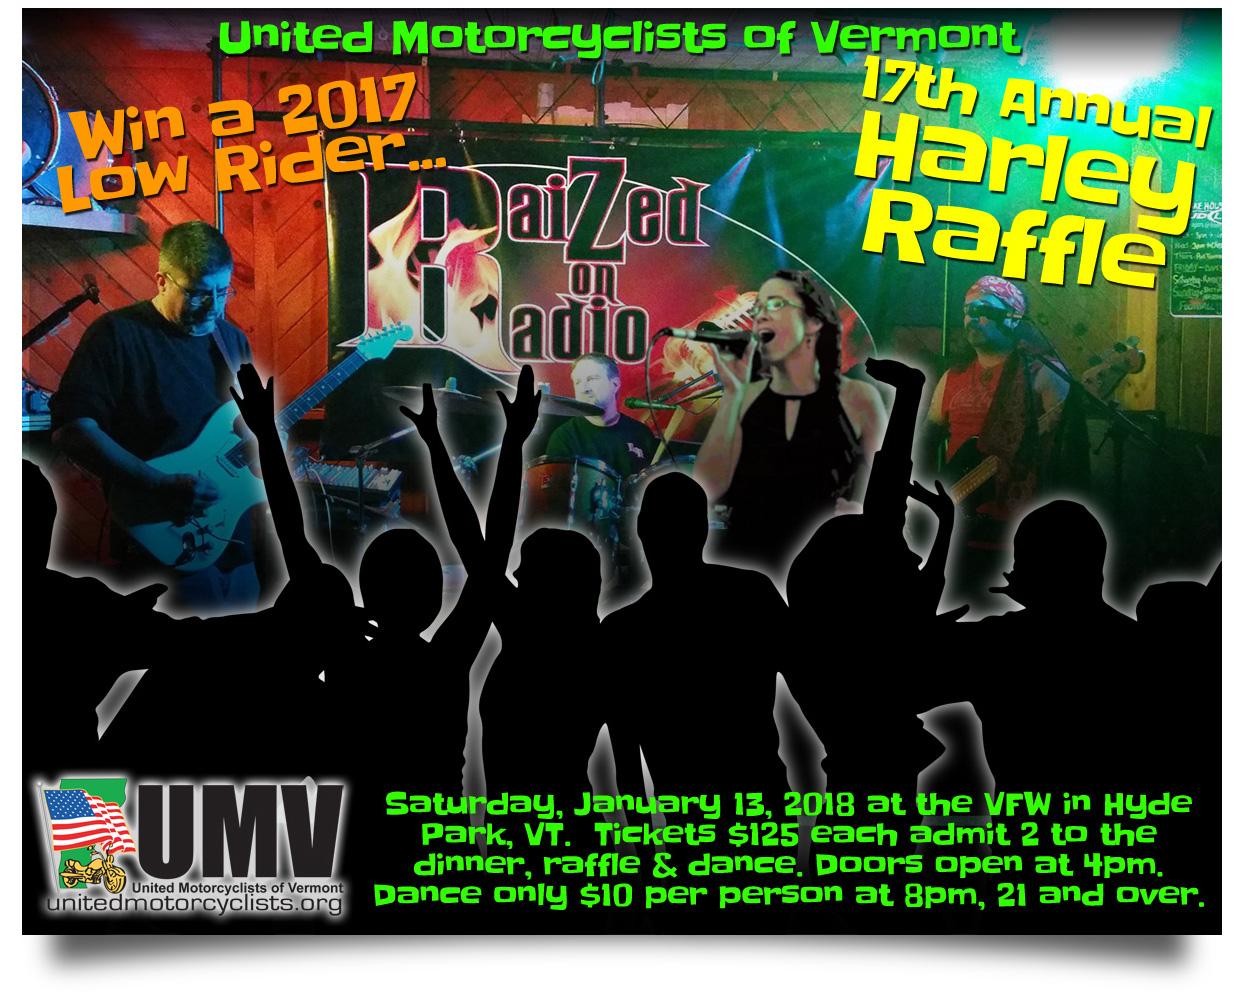 Raized on Radio UMV Harley Raffle